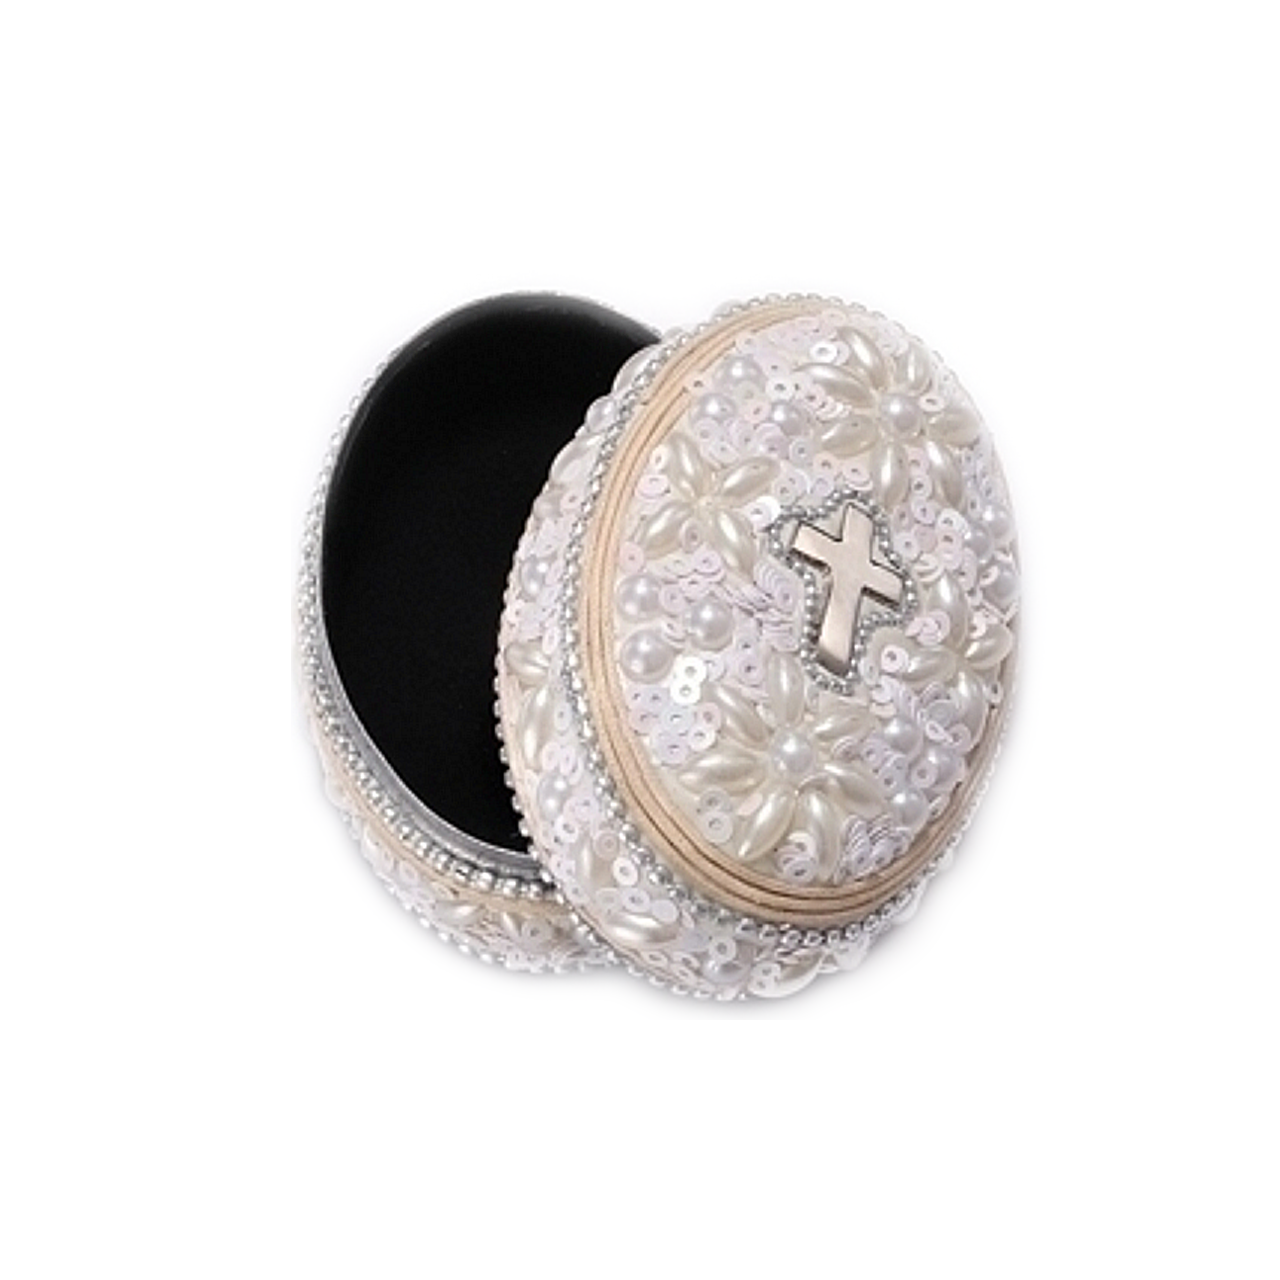 Rosary Case   Keepsake Box   Simulate Pearls & Sequins   3